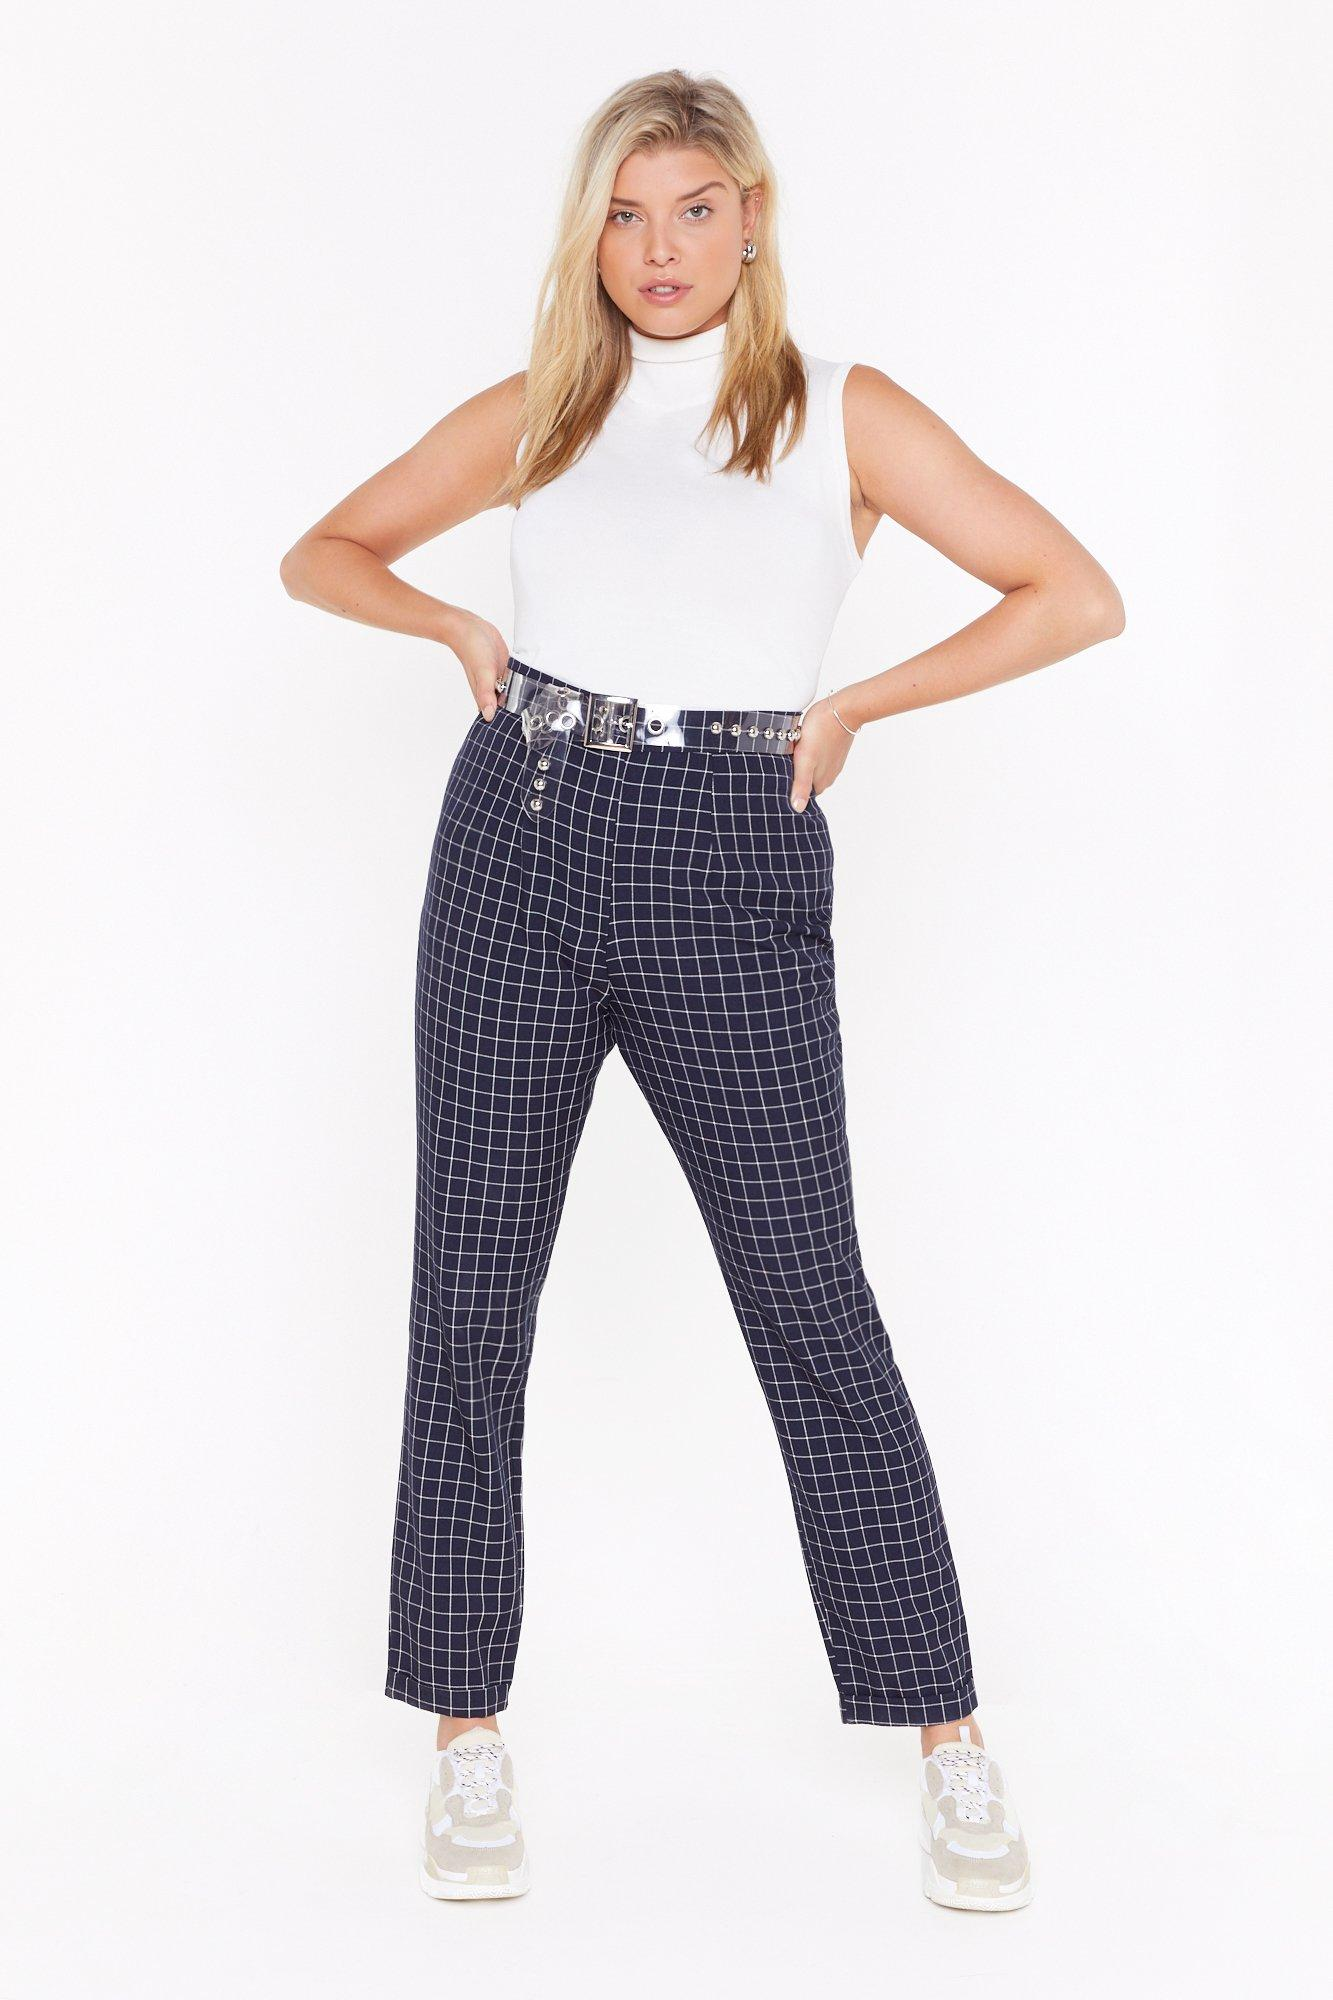 Image of Line 'Em Up Check High-Waisted Pants